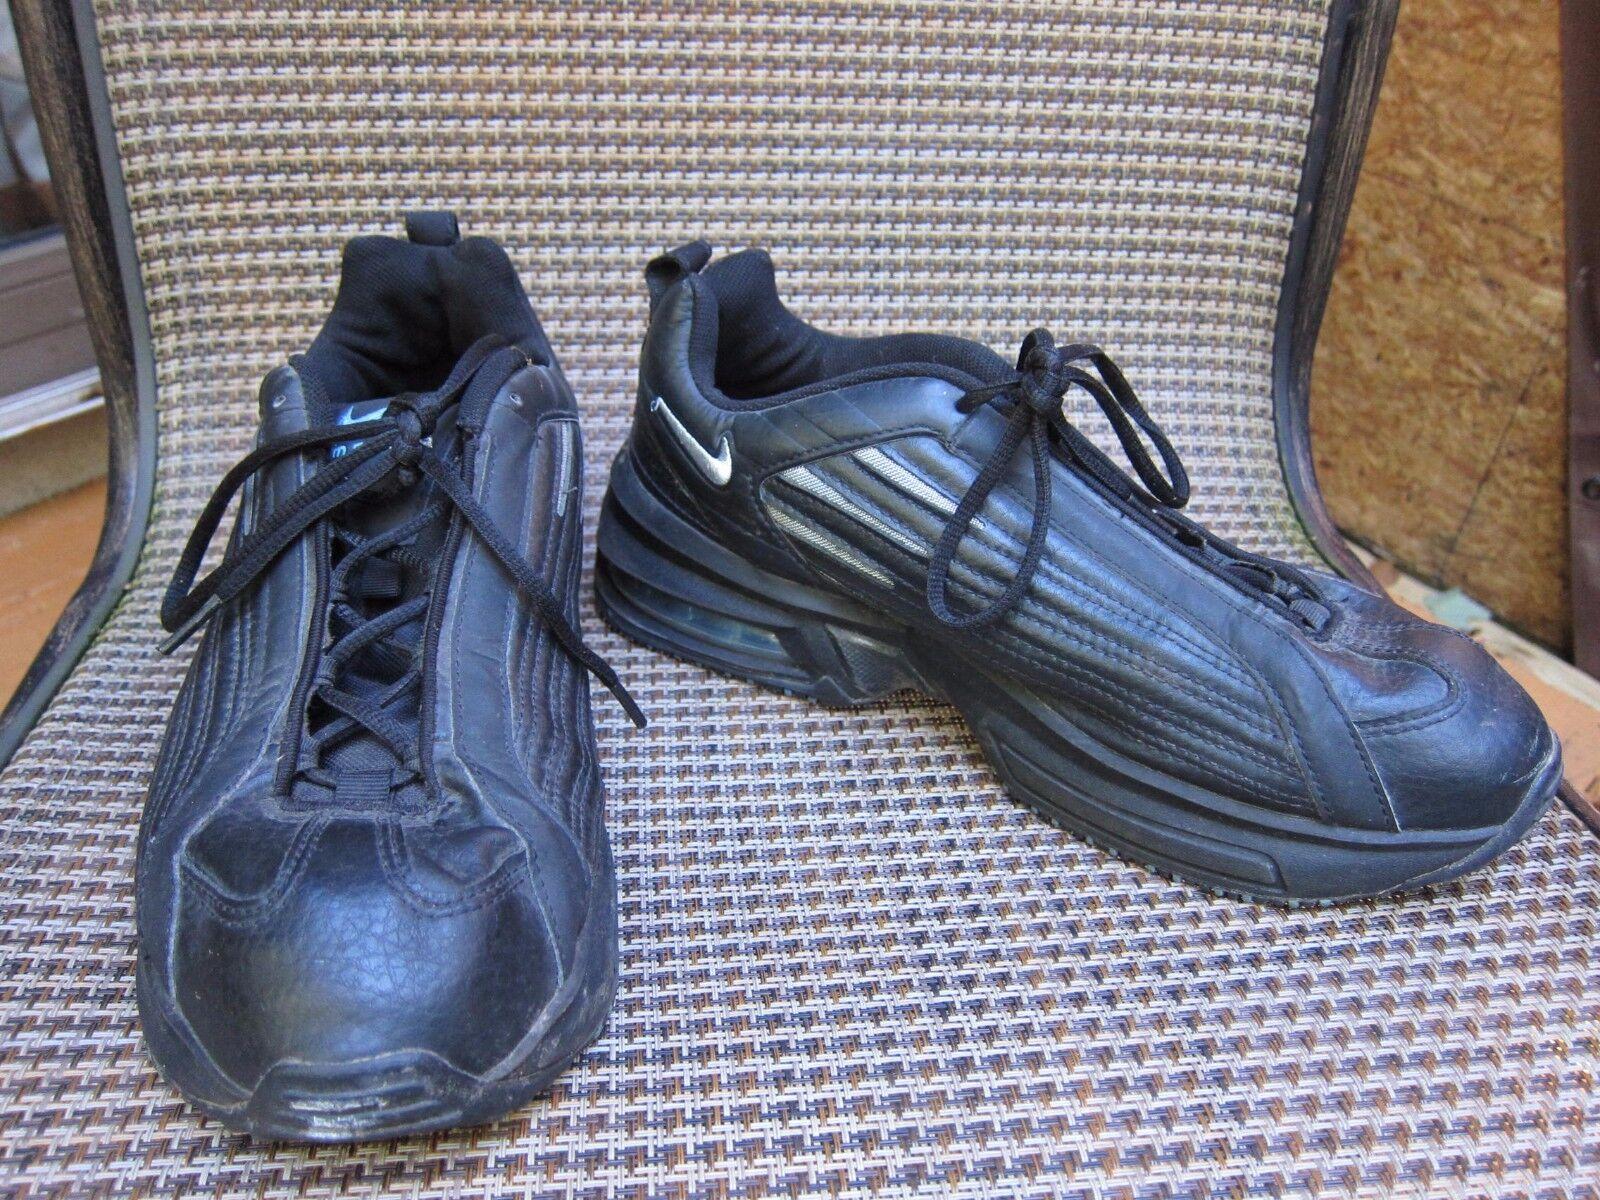 Max air trainer vintage schwarz 11,5 nike sneaker kann shoemen's 11,5 schwarz m usa. 46e3c0